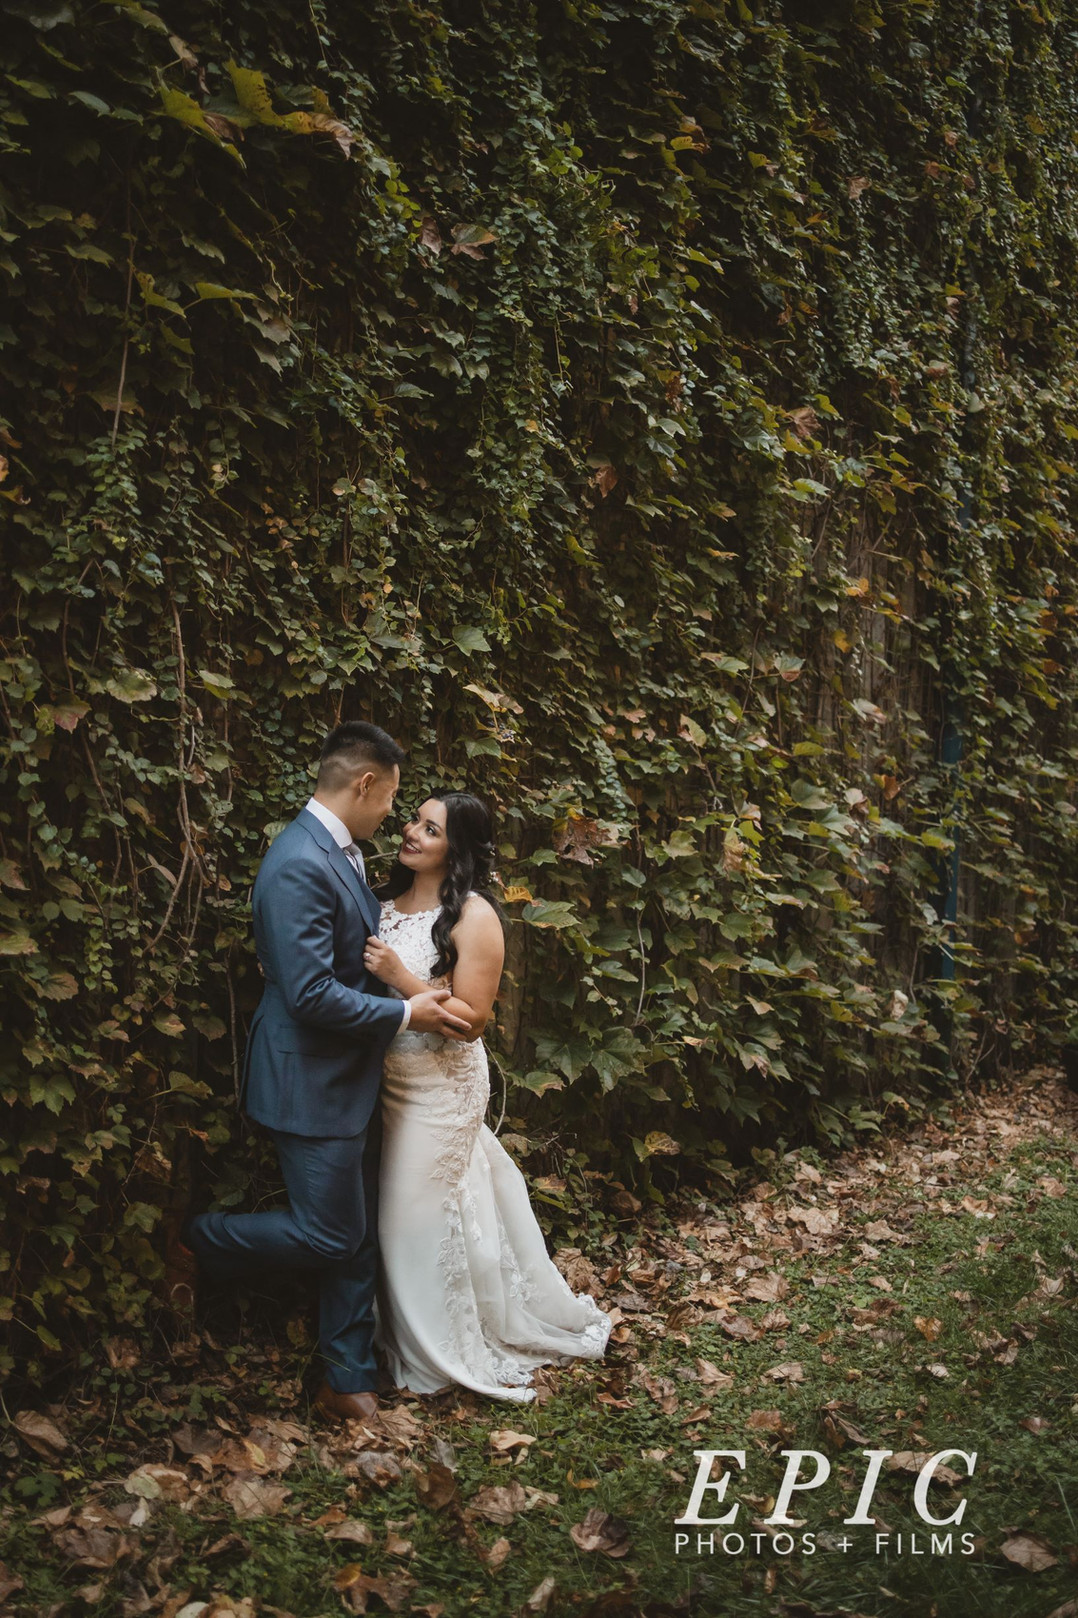 Marissa & Kevin | Hickory Street Annex | Dramatic Industrial Wedding